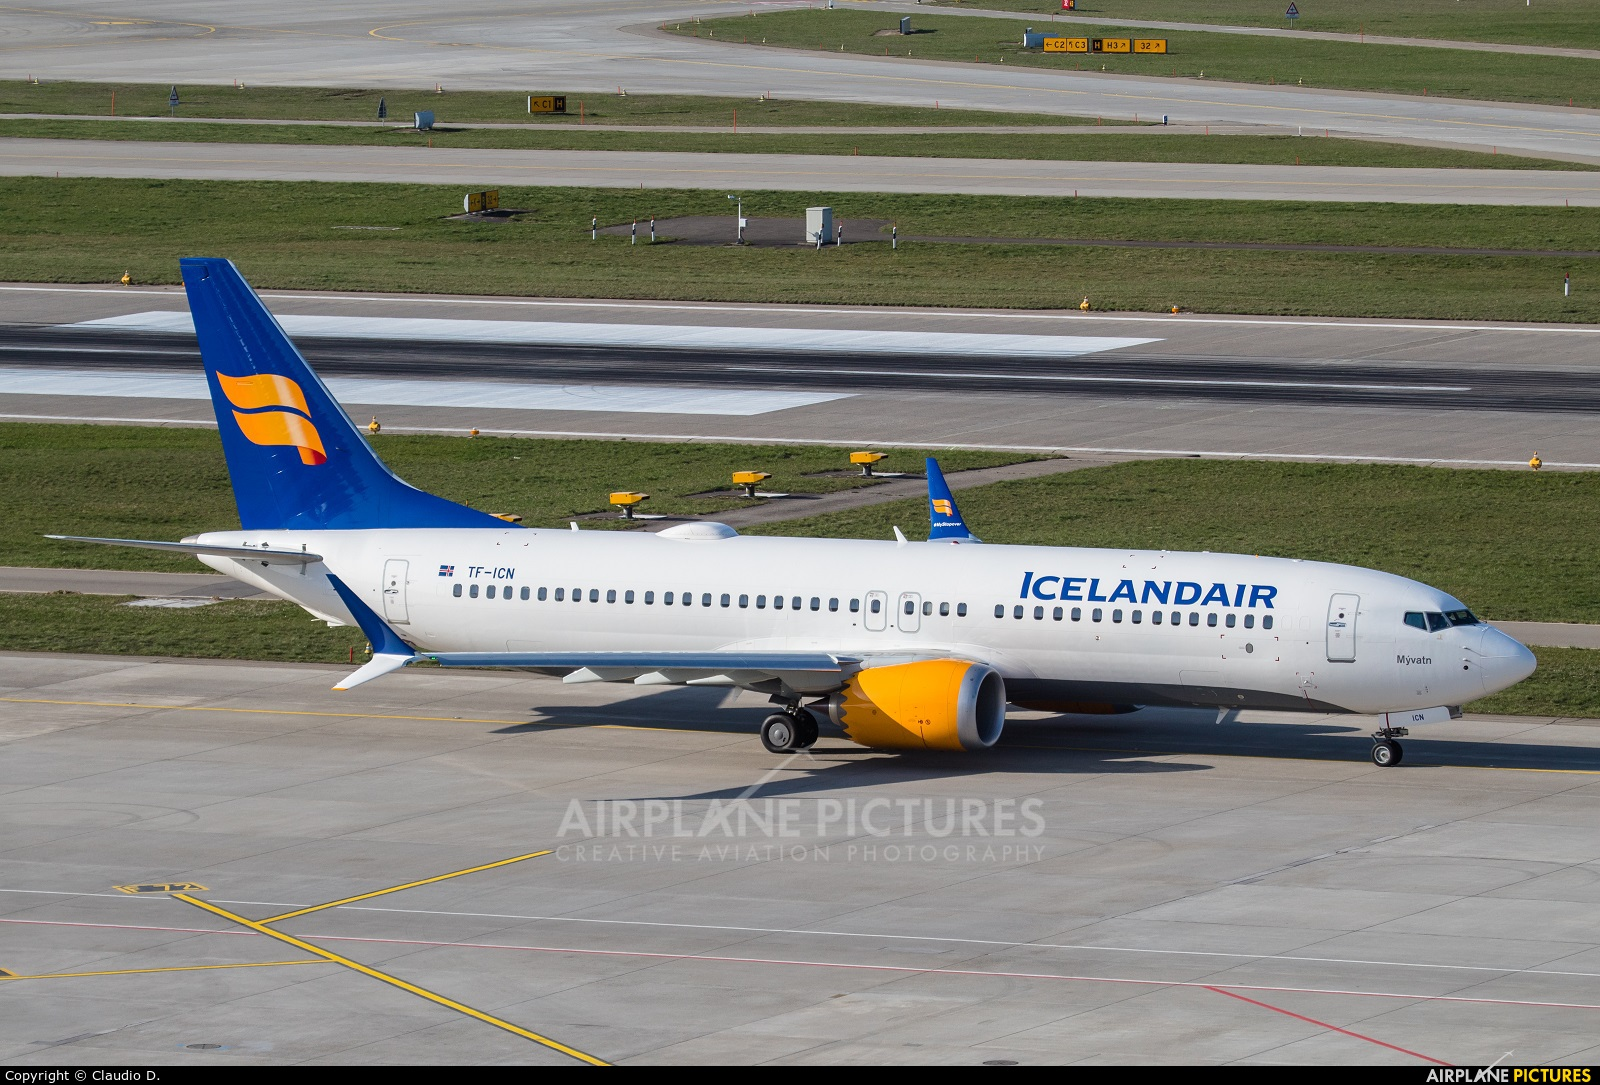 Icelandair TF-ICN aircraft at Zurich